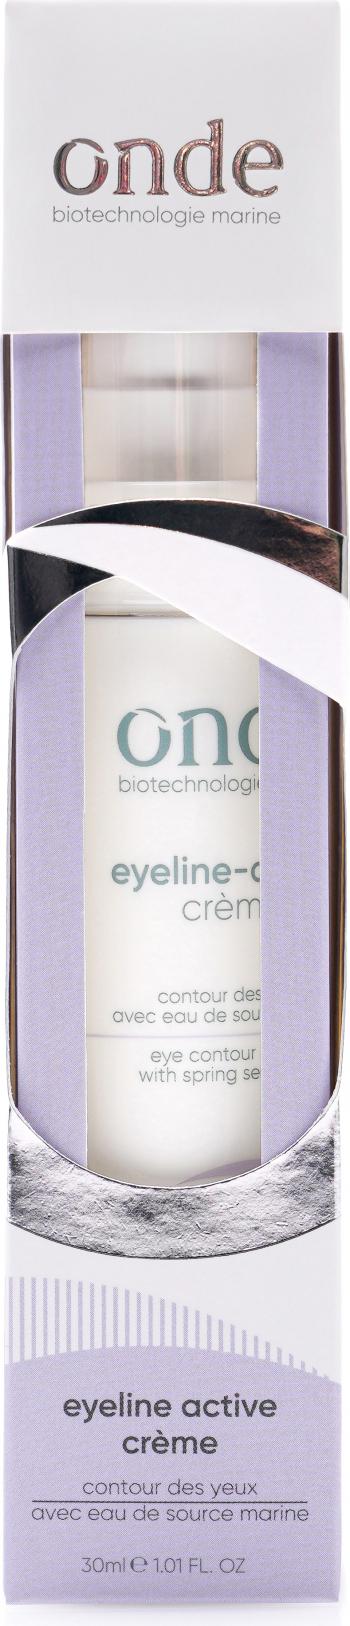 Onde Eyeline-Active Creme cu apa de origine marina 30ml